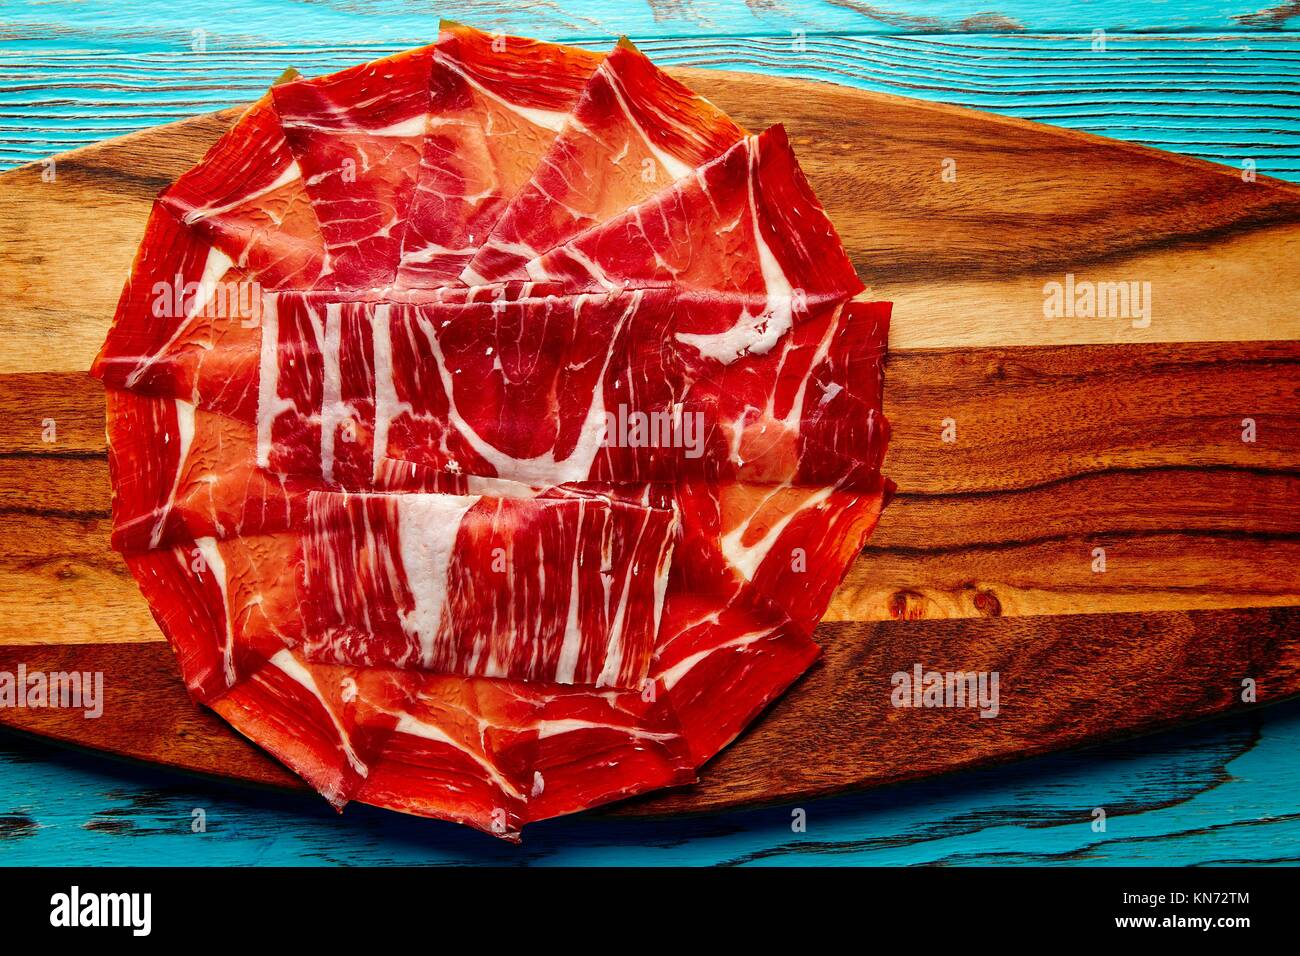 Jamon iberico han from Andalusian Spain Tapas. - Stock Image